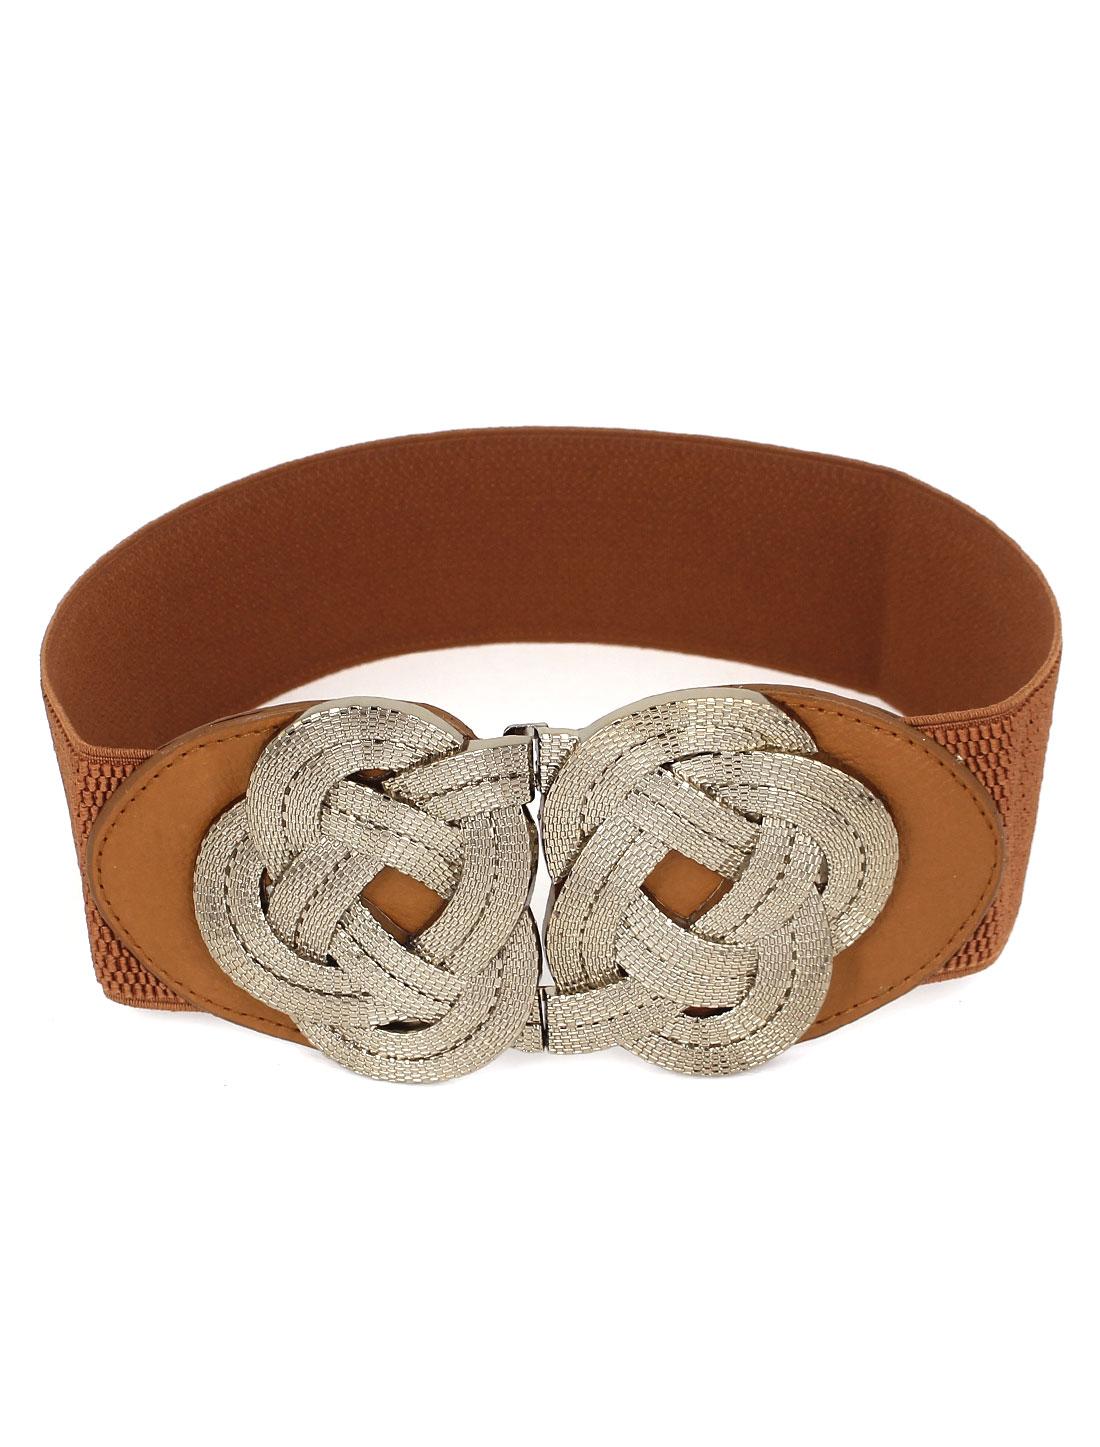 Women Flower Design Metal Interlock Buckle Faux Leather Stretchy Cinch Waist Belt Band Waistband Brown